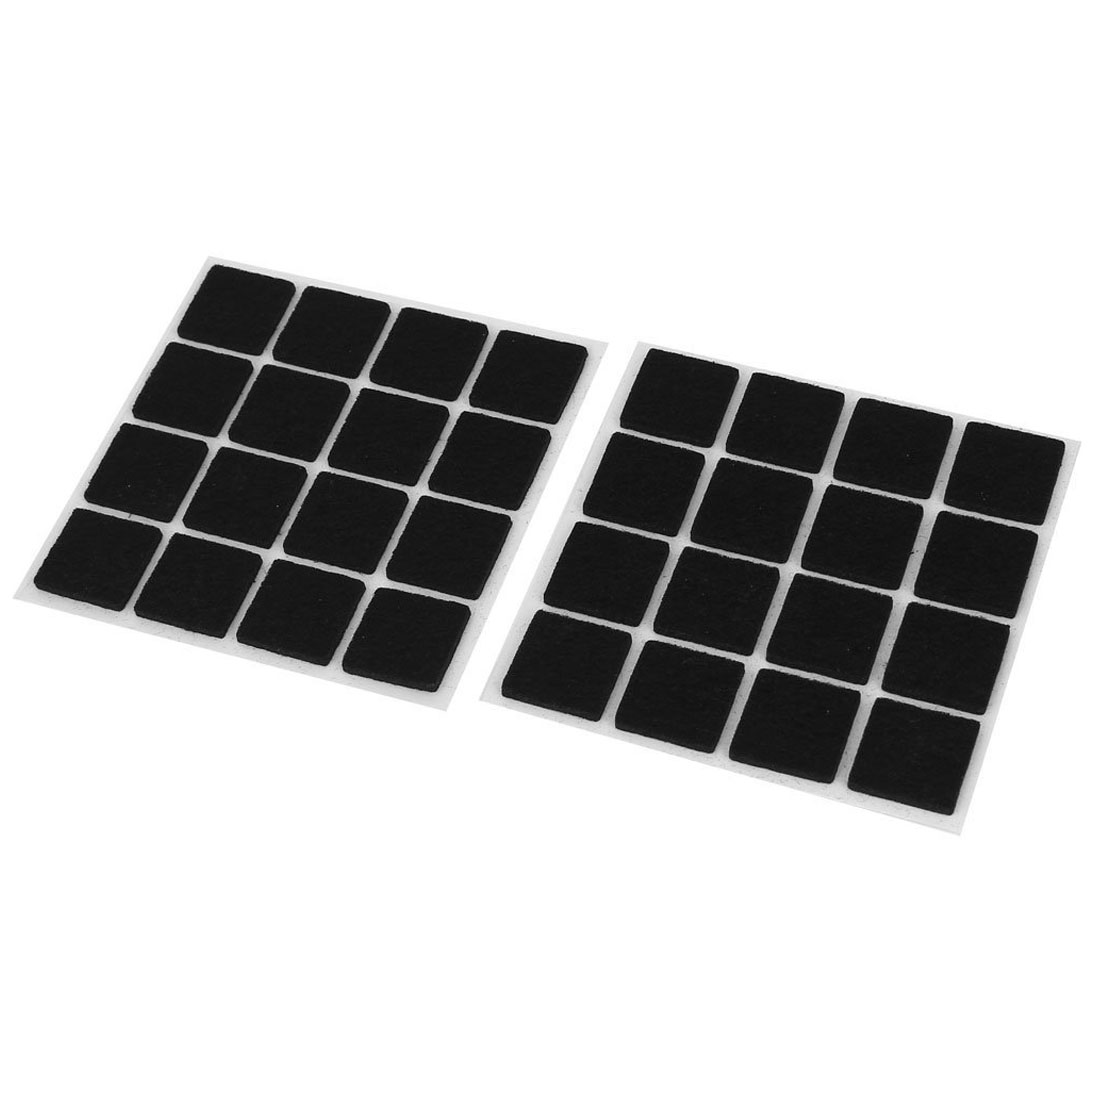 Self Adhesive Floor Protectors Furniture Felt Square Pads